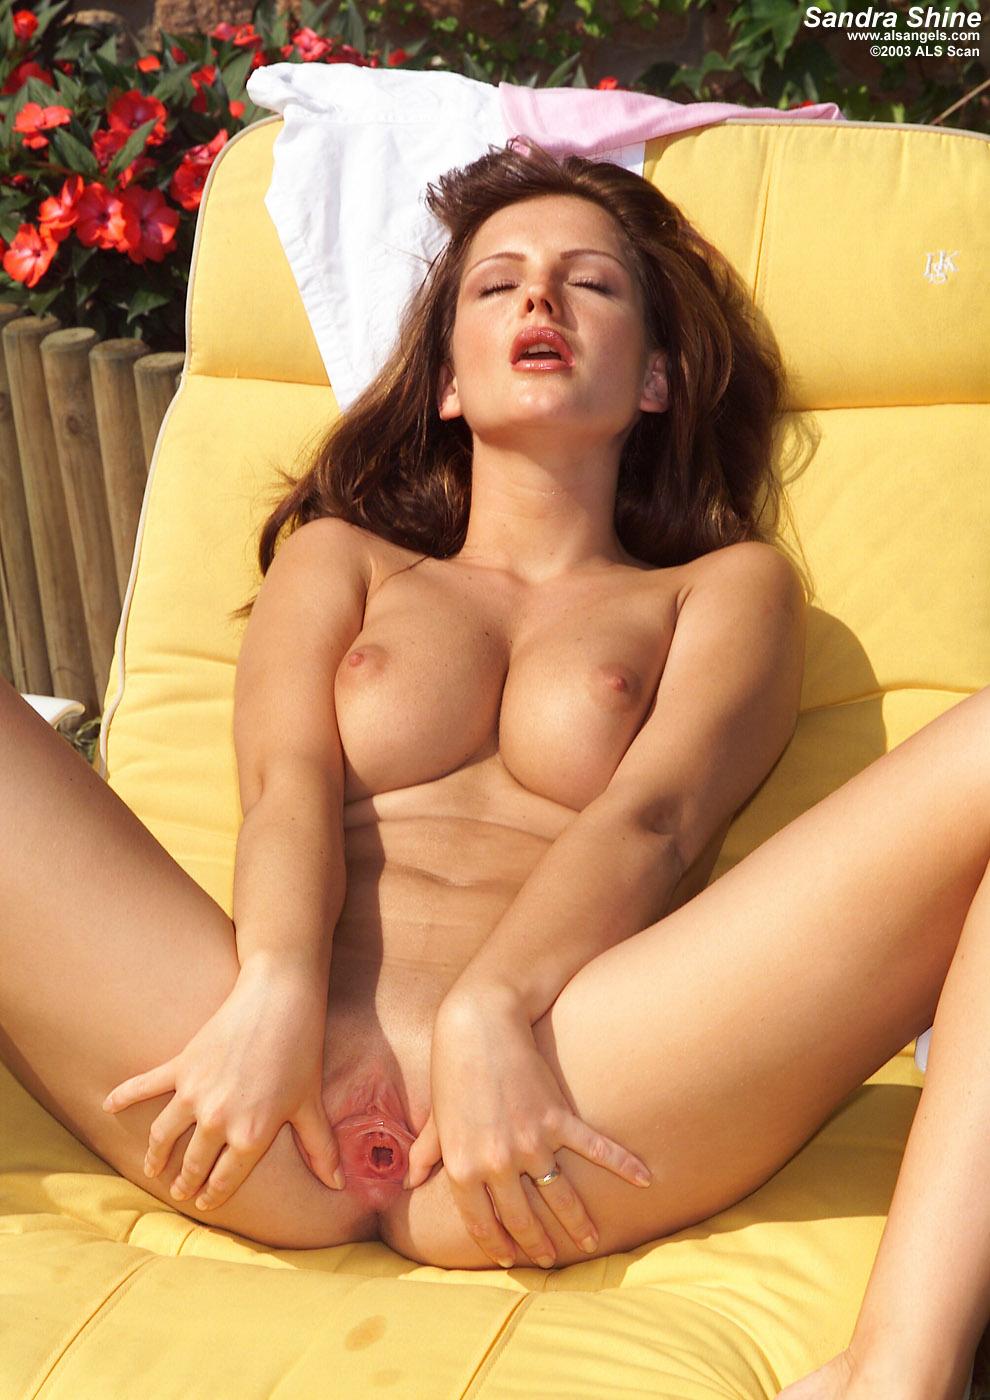 Фото порно модели сандры шайн в сияние 11 фотография